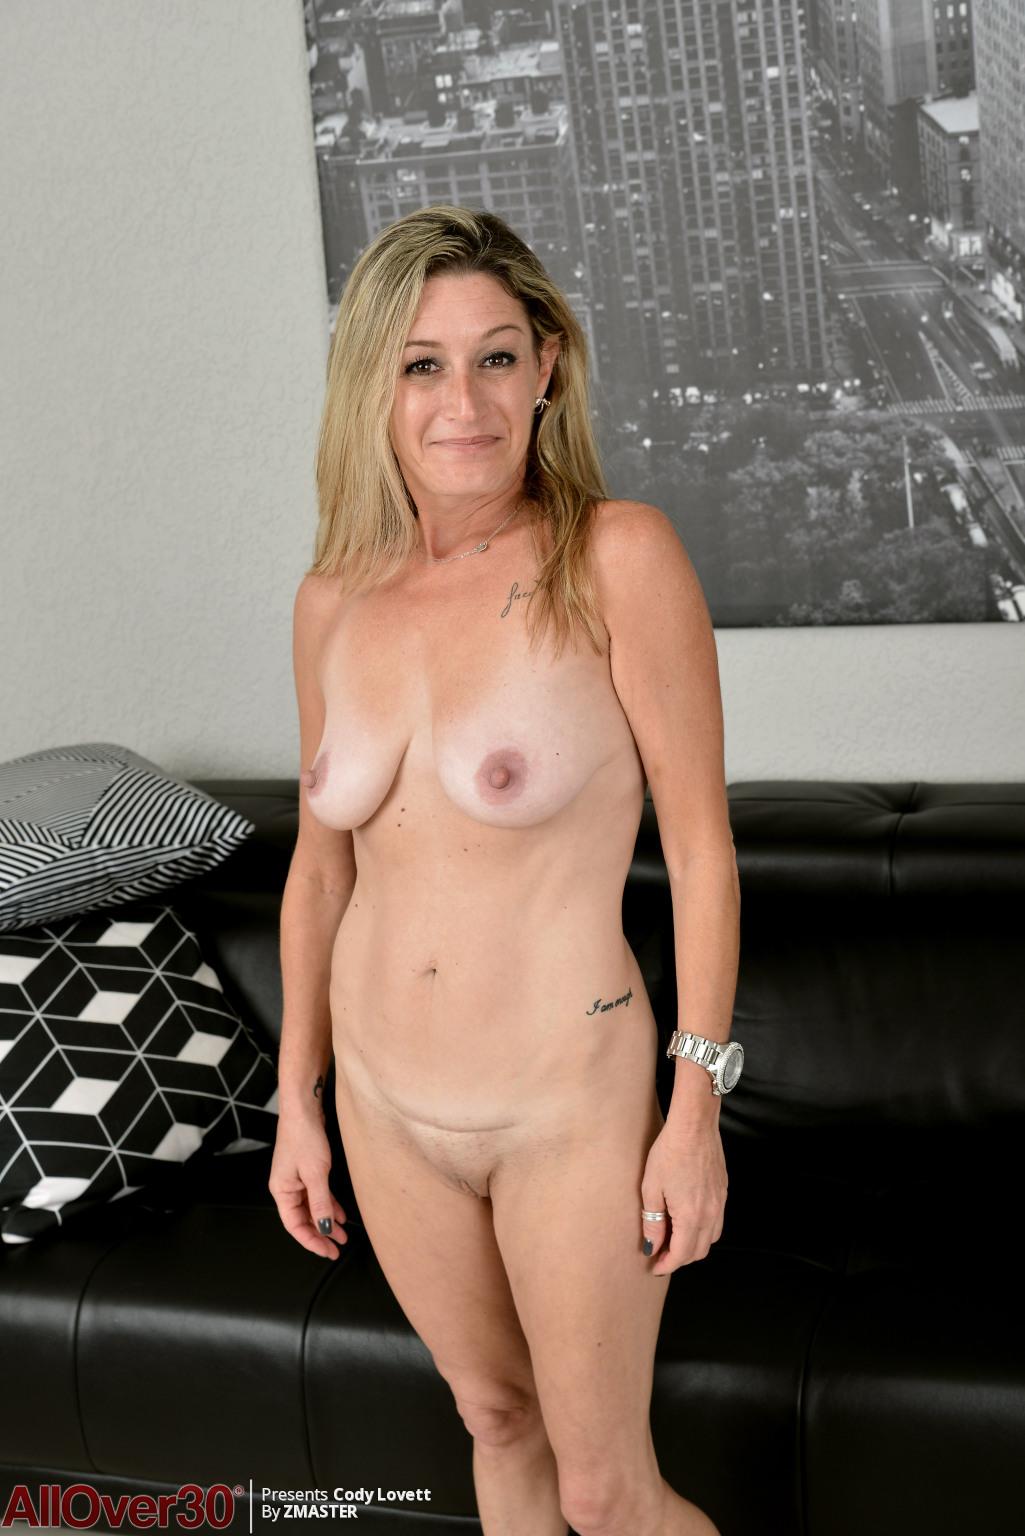 Sex domination video sharing